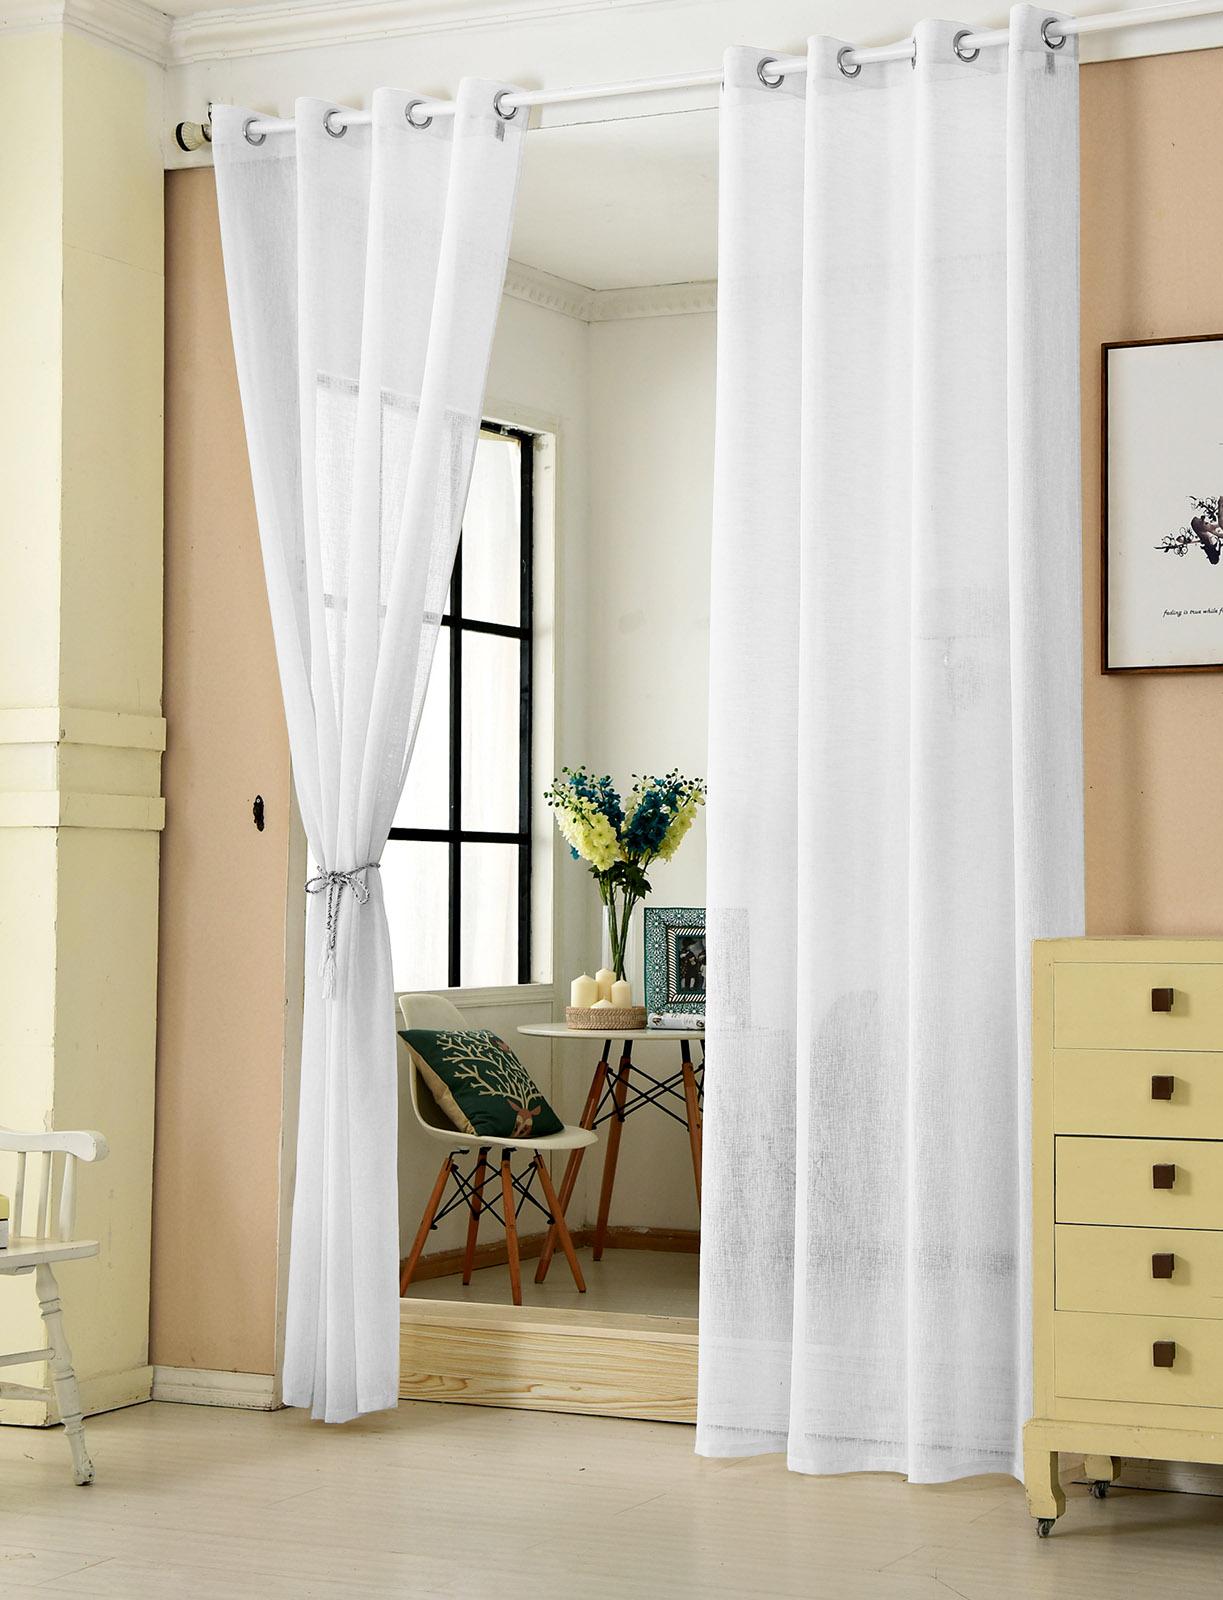 gardinen vorh nge stores transparent senschal dekoschal voile leinen optik 631 ebay. Black Bedroom Furniture Sets. Home Design Ideas